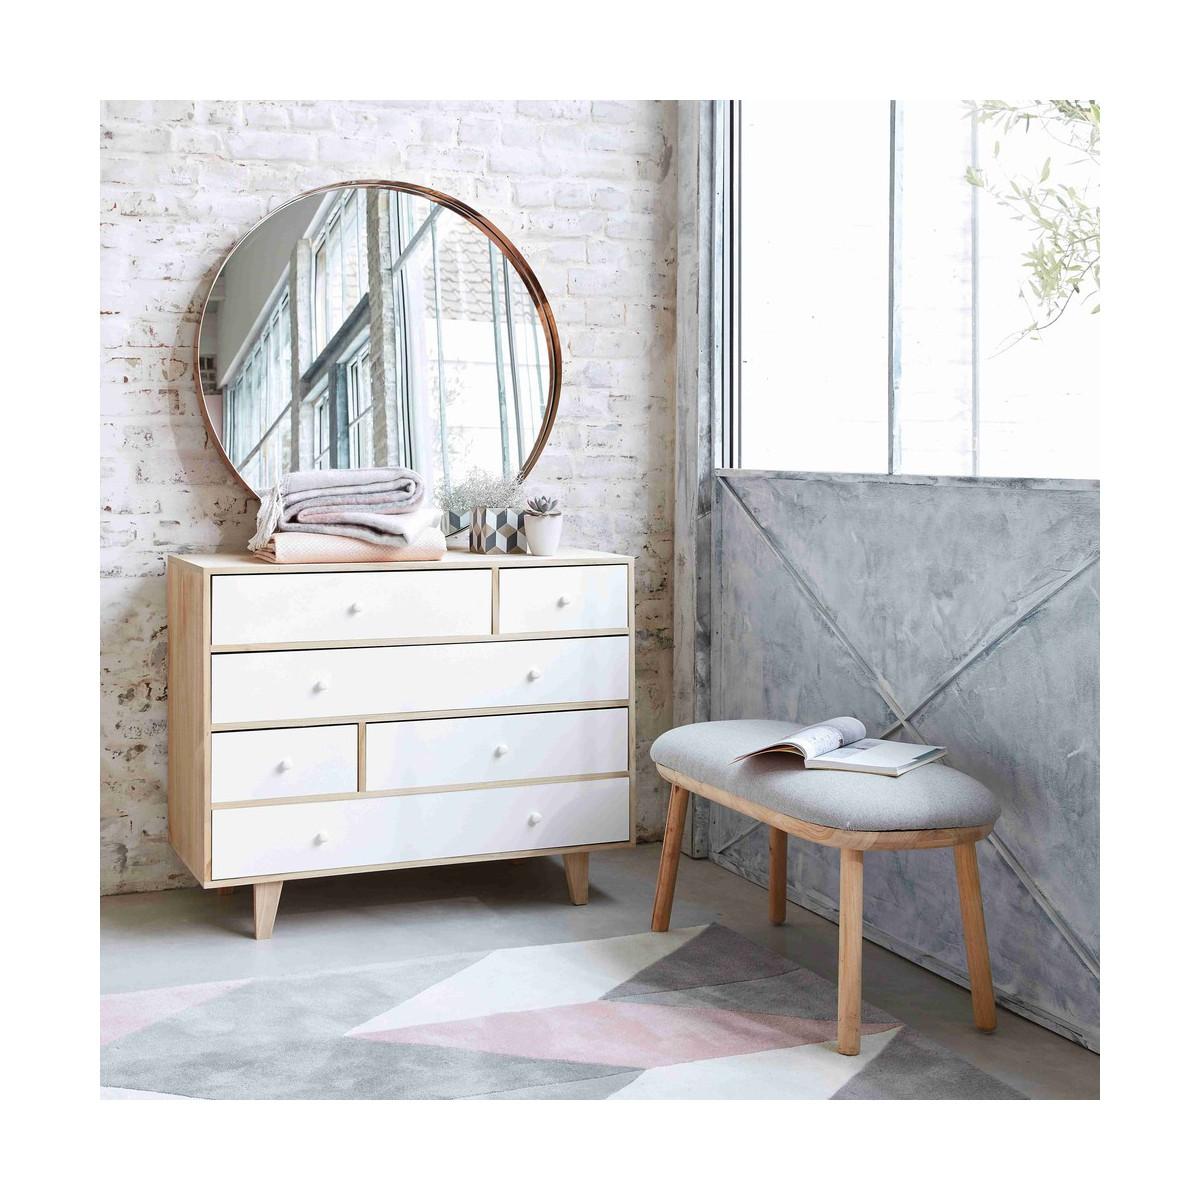 miroir rond metal maison du monde ventana blog. Black Bedroom Furniture Sets. Home Design Ideas